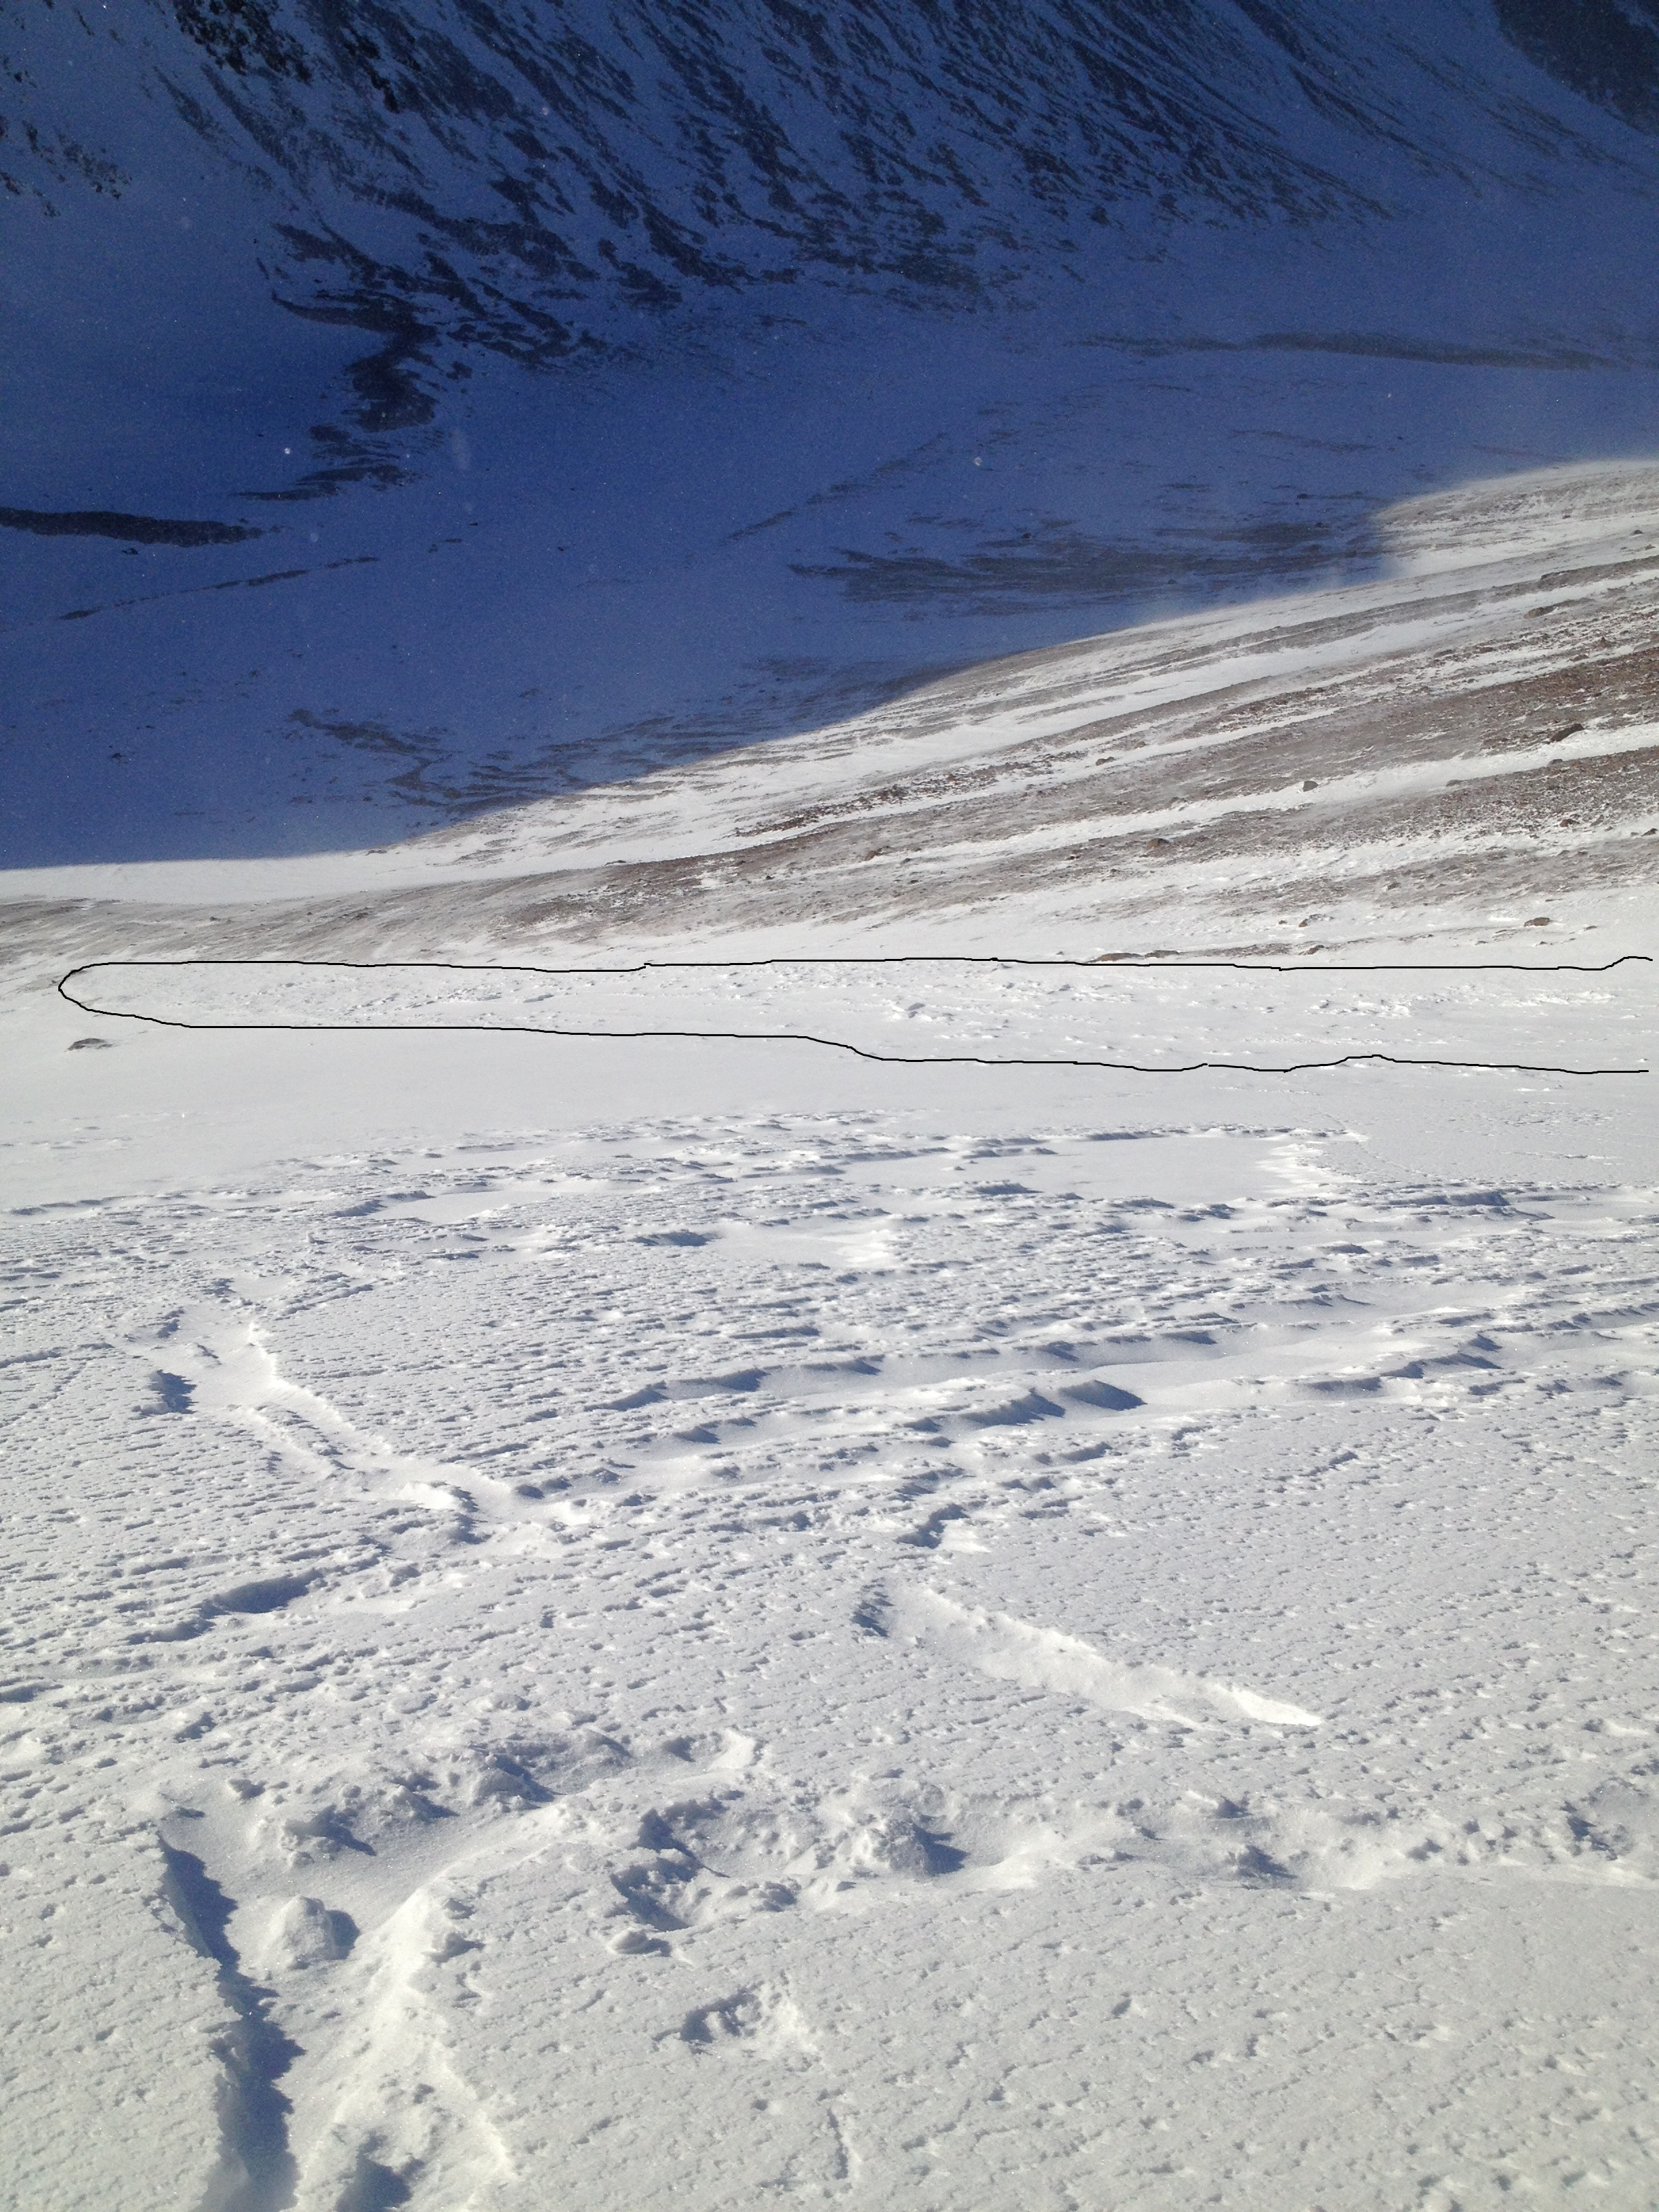 slide path and debris